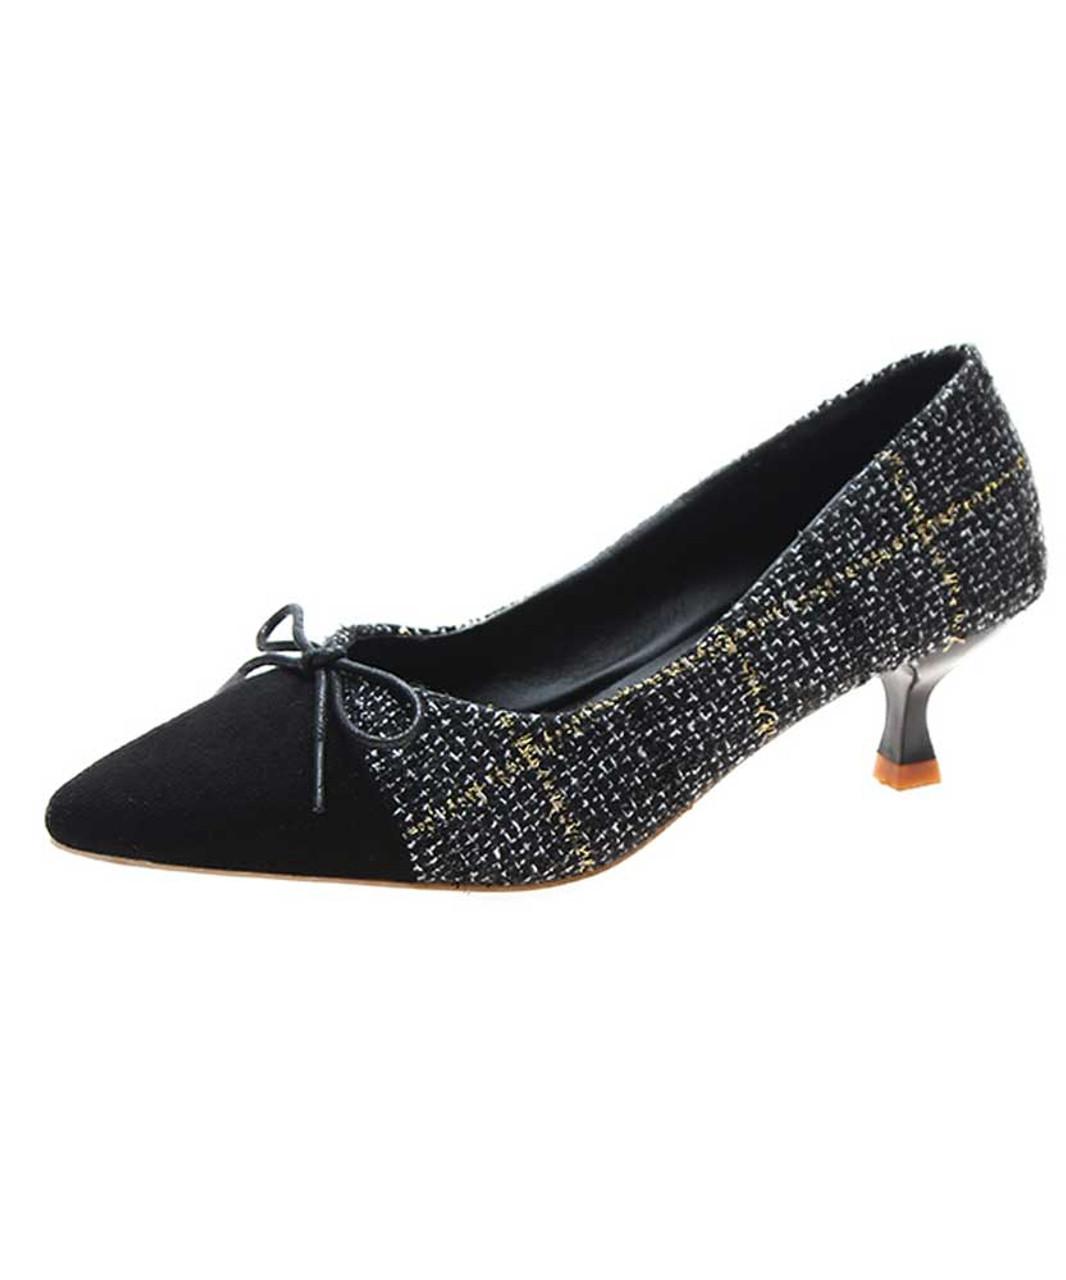 Black Check Bow Tie Slip On Heel Dress Shoe Womens Heel Dress Shoes Online 2159ws